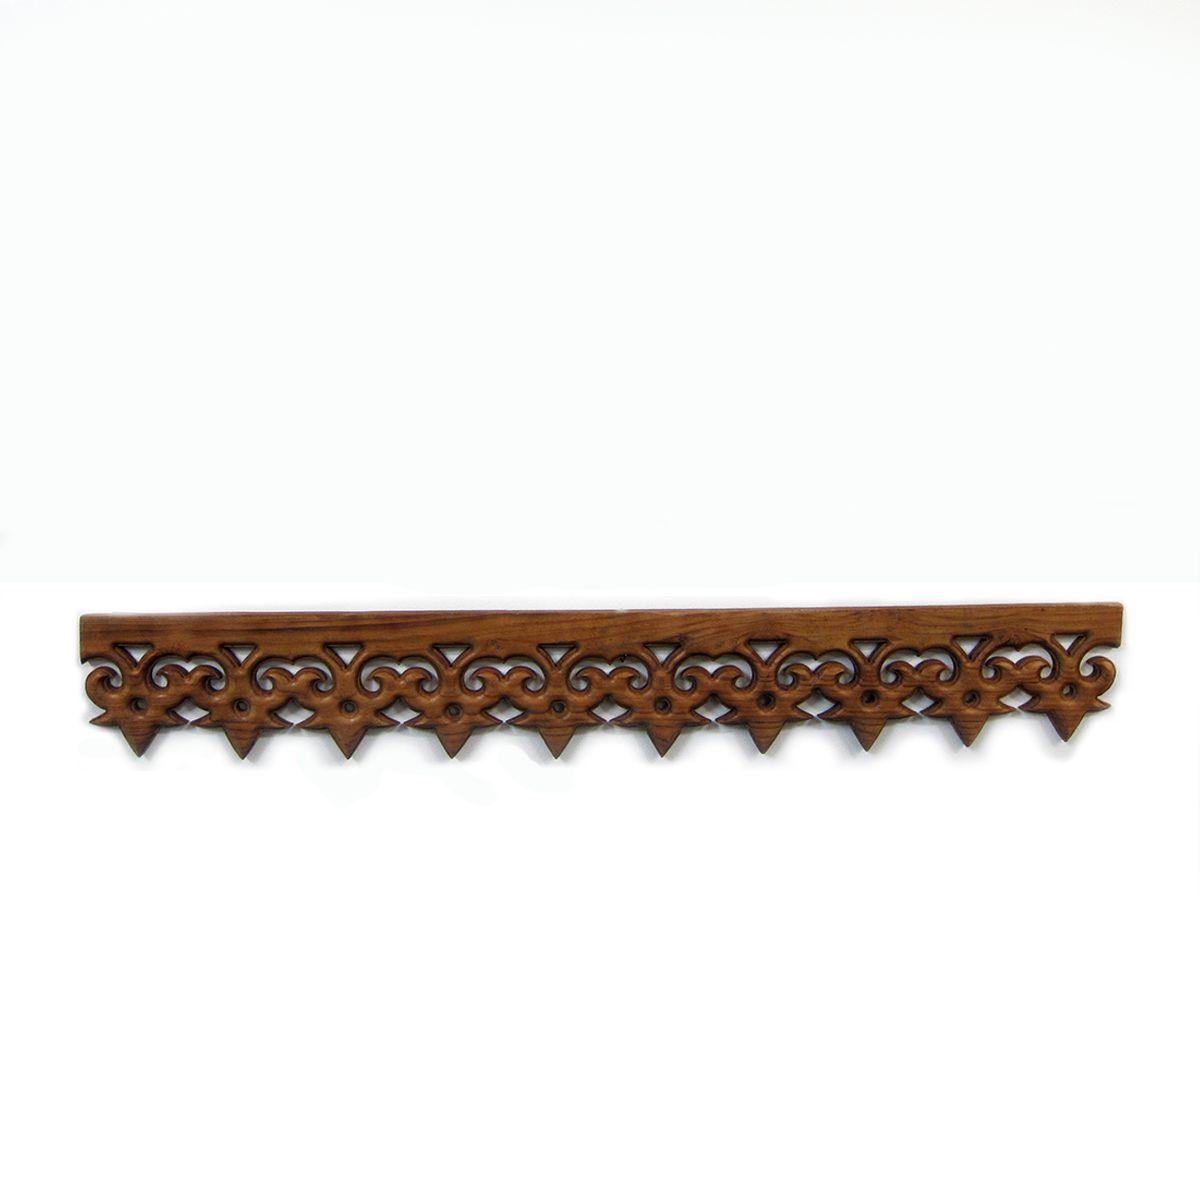 Furniture · Teak Wood Architectural Moulding Trim Pieces.